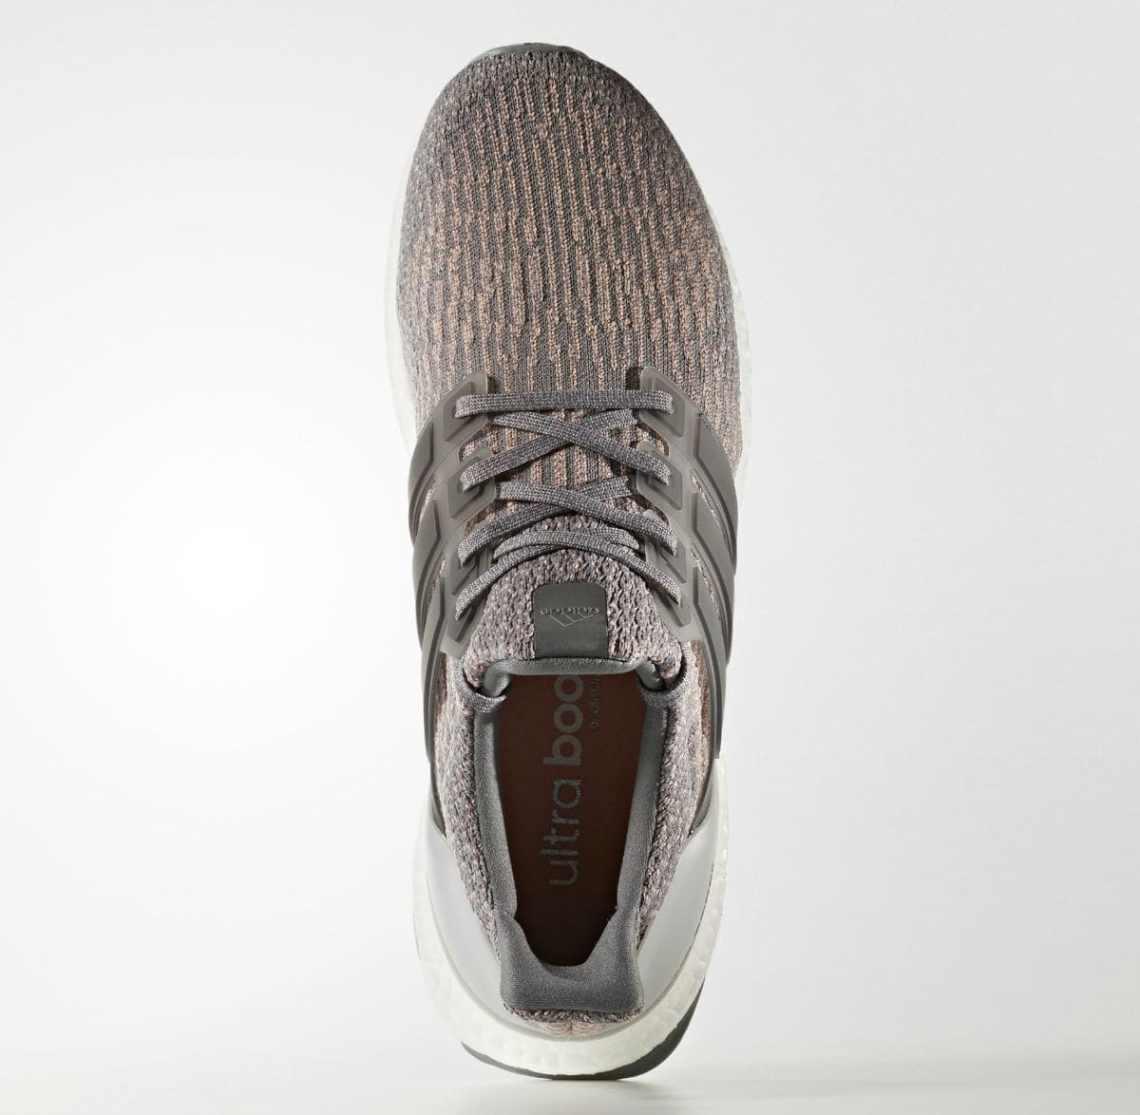 adidas Ultra Boost 3.0 Grey/Pink